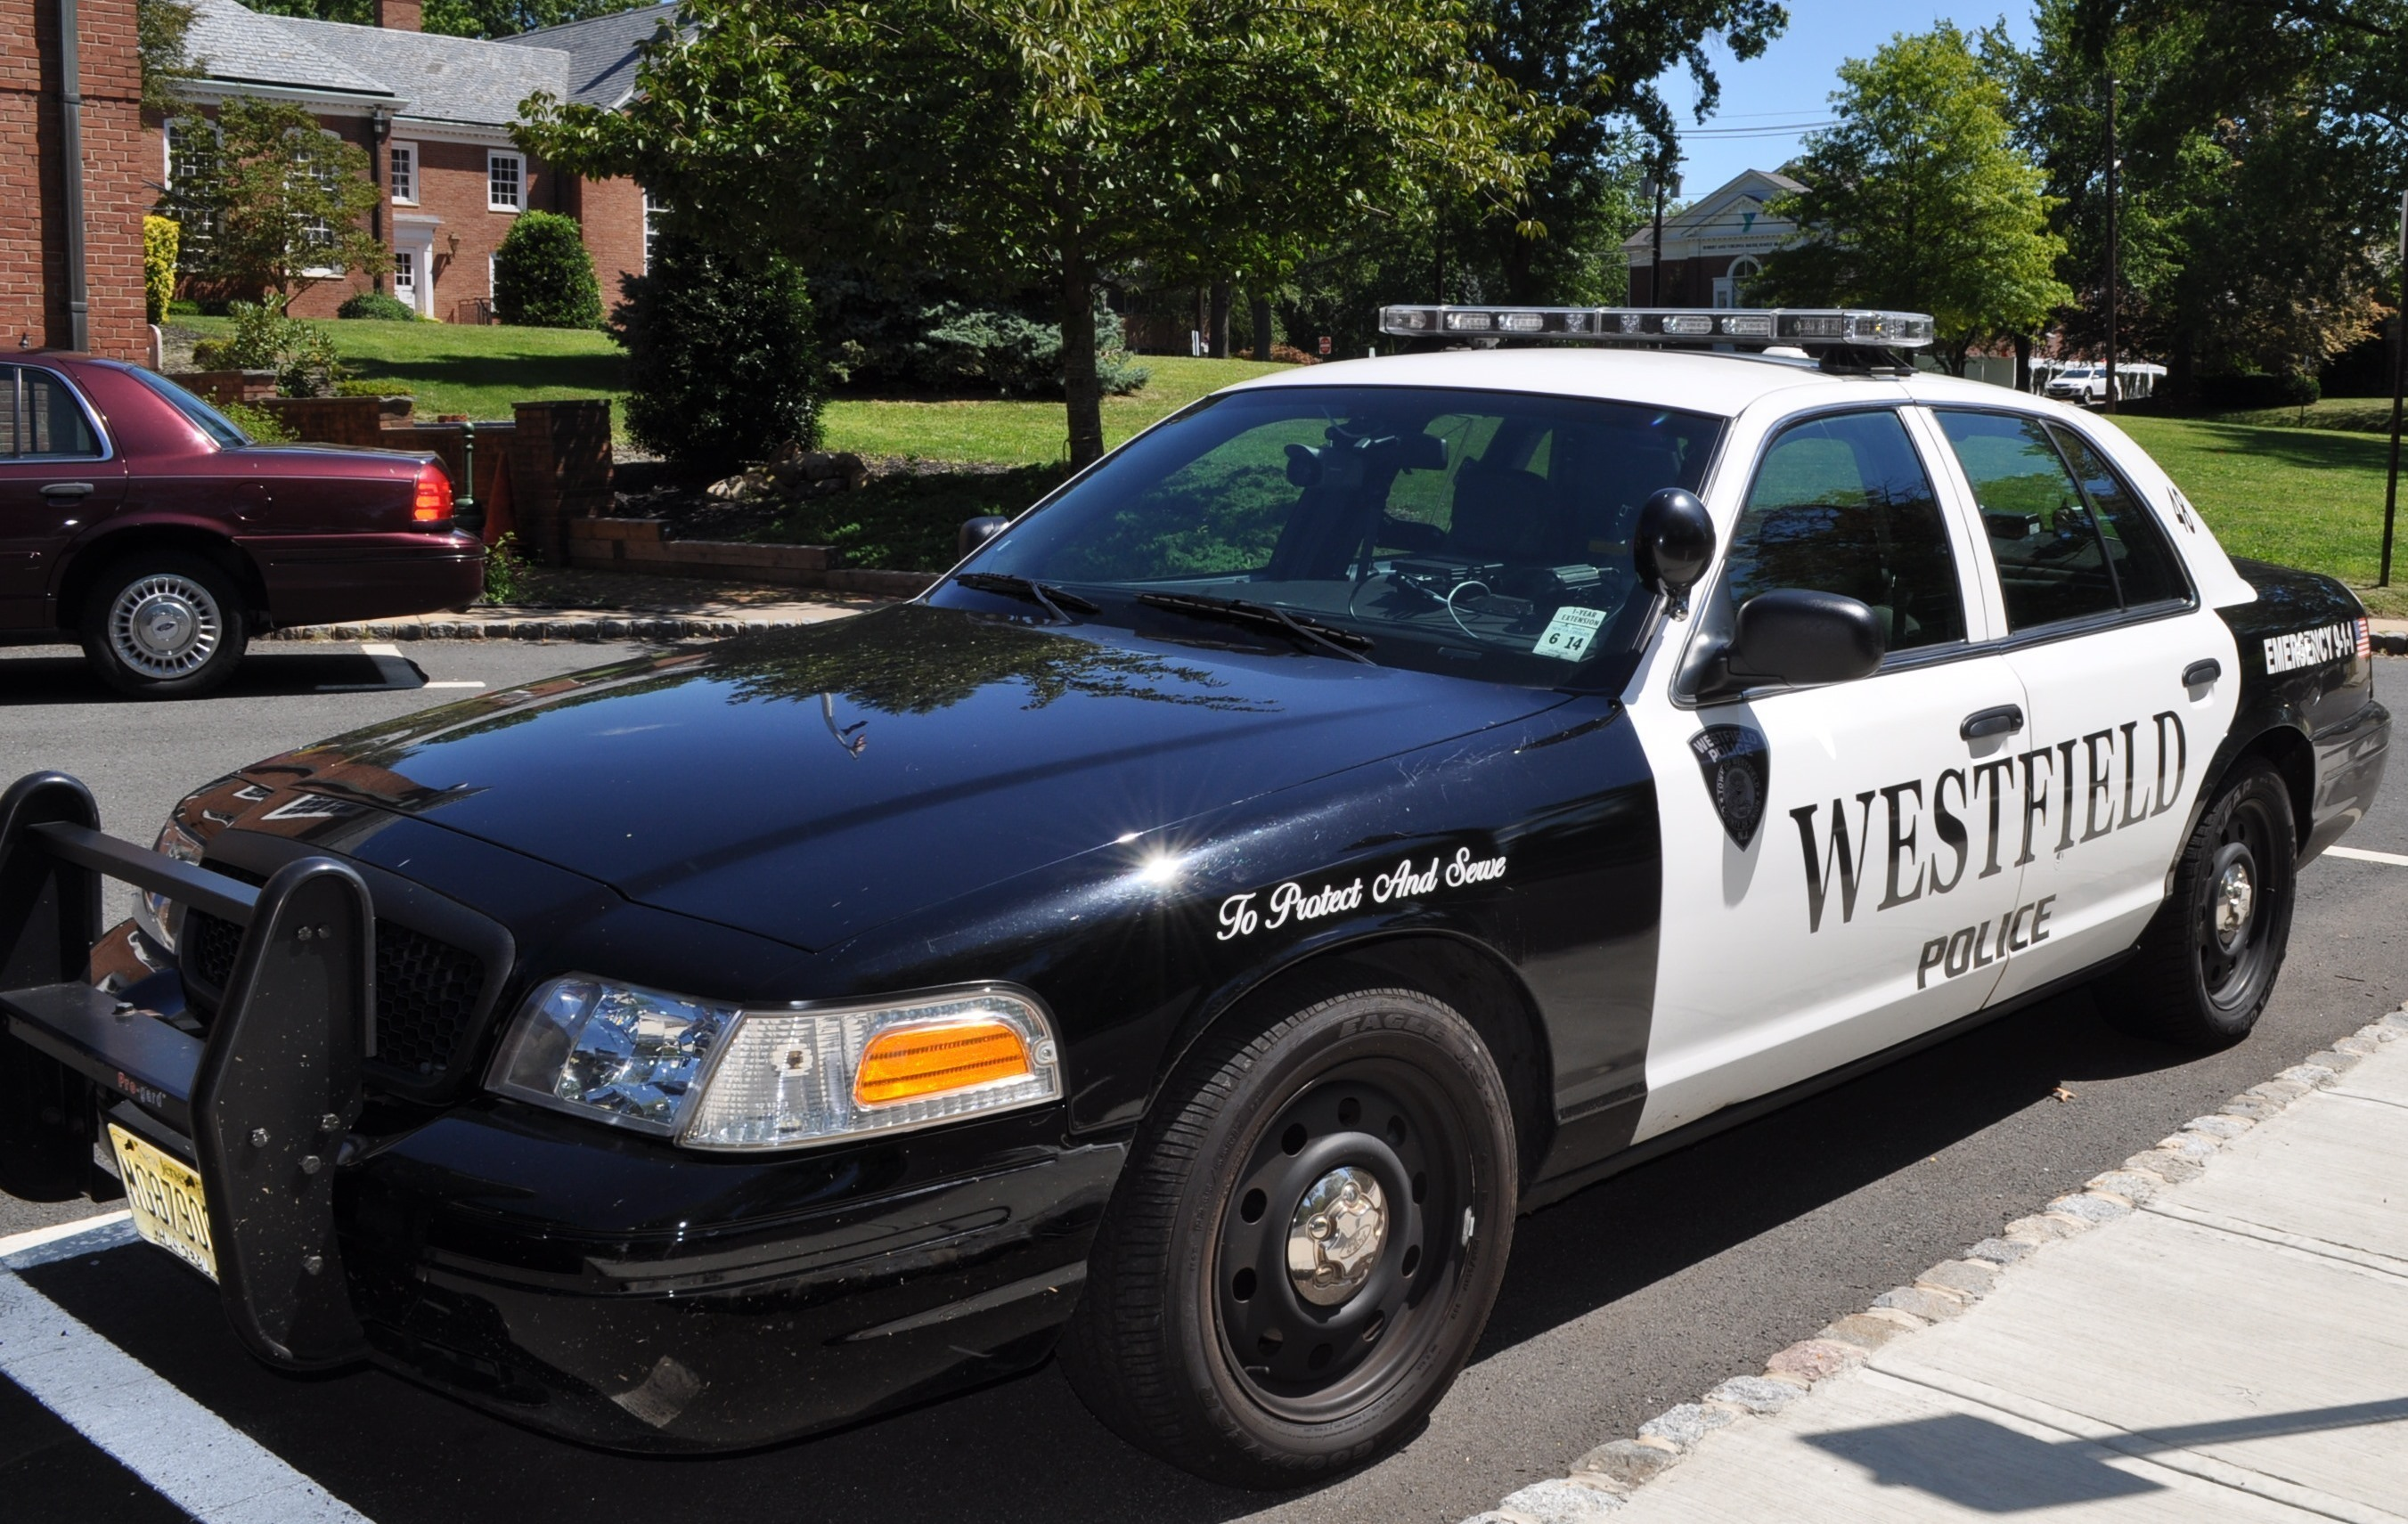 a32551b6637812f04e4d_2d2f3d5ae25a5fcfcfbd_police_car.JPG